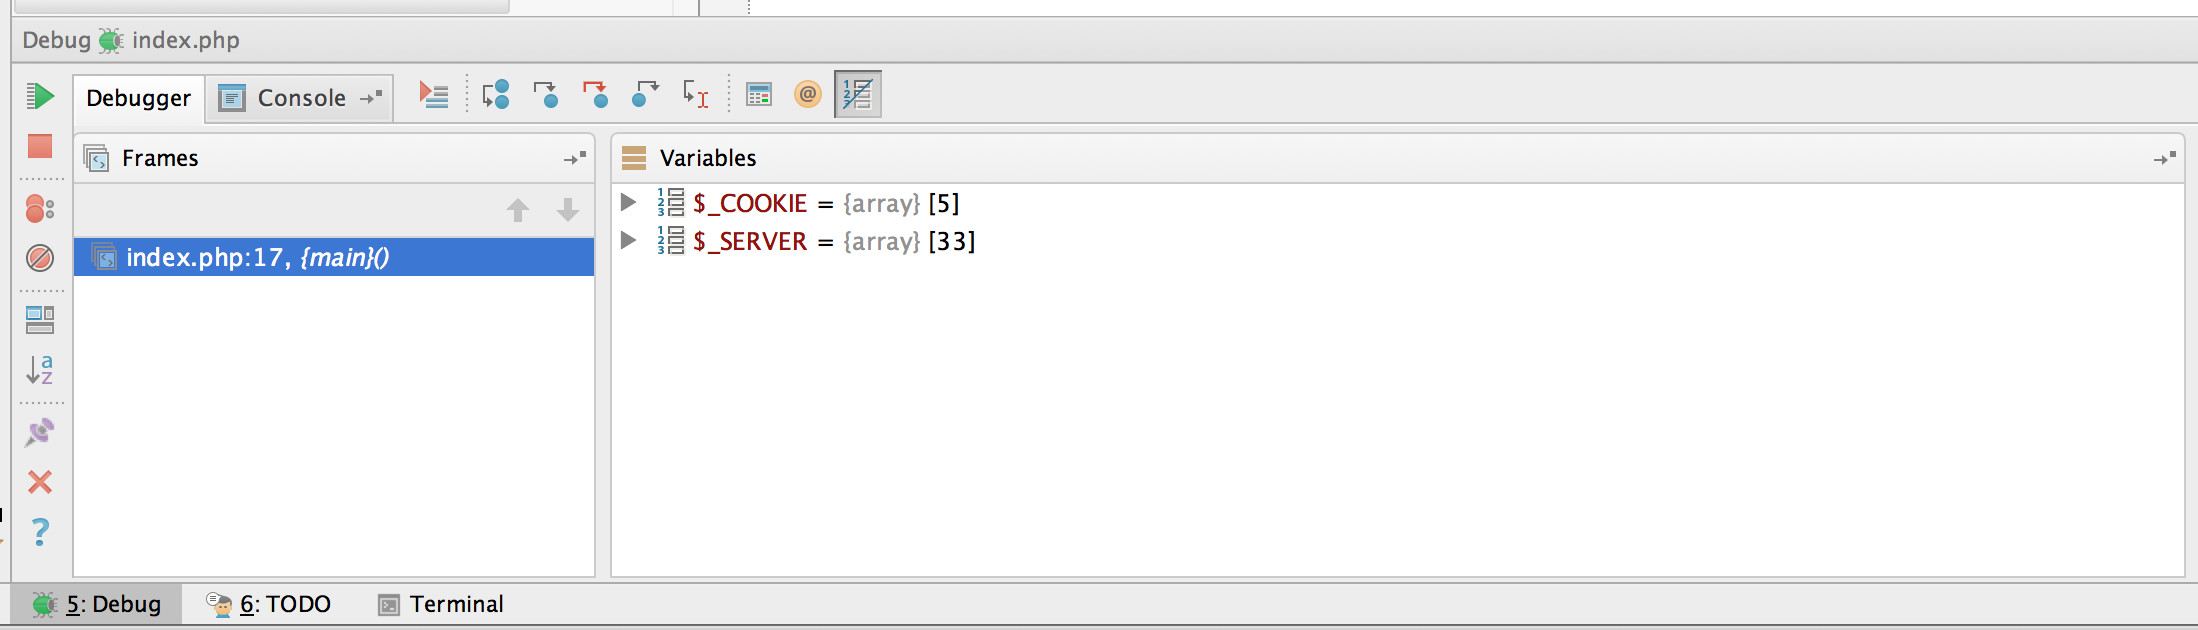 PHPStorm Debug